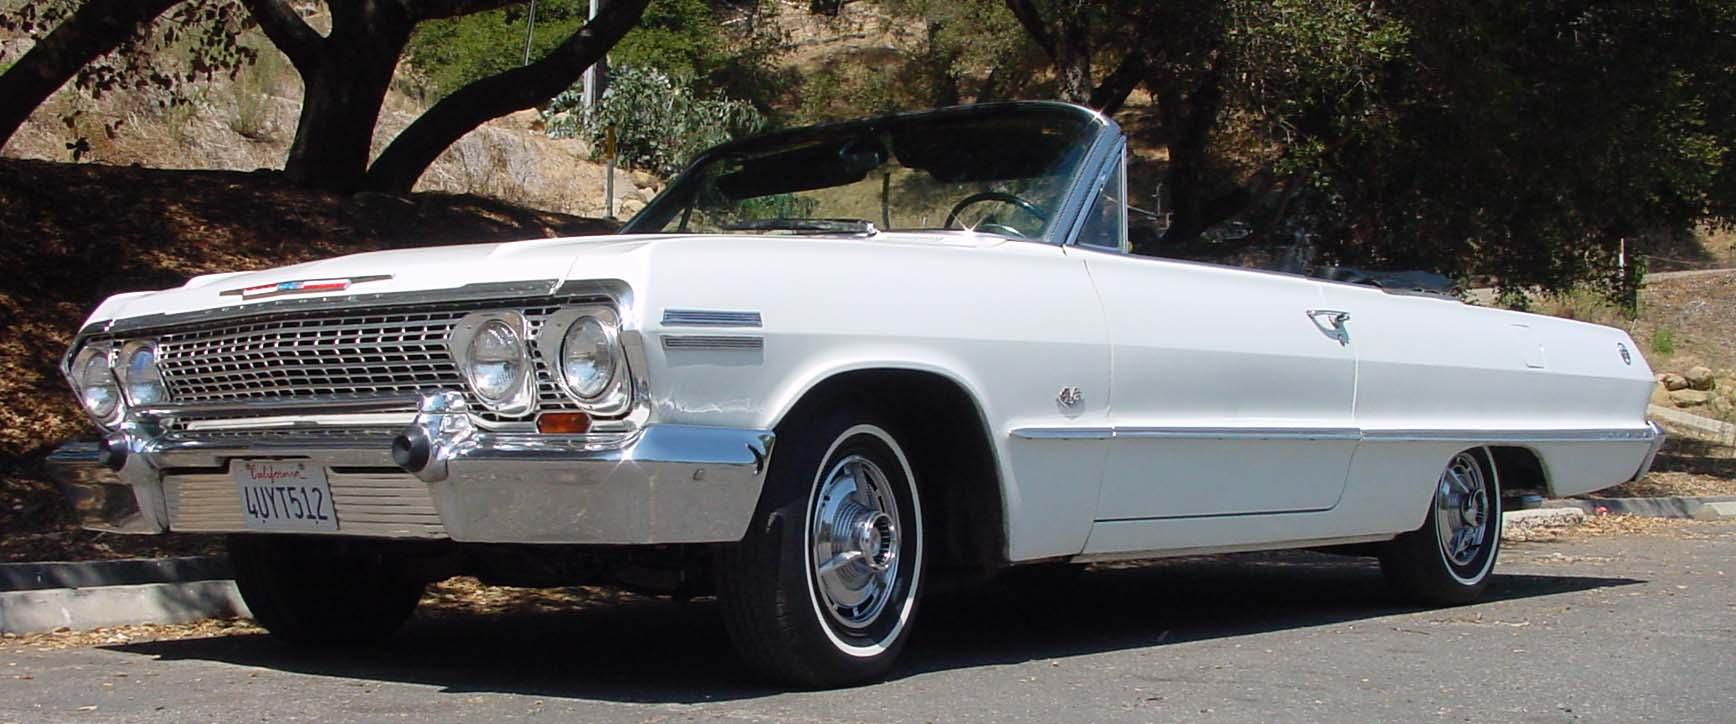 1963 chevy impalas for sale autos weblog. Black Bedroom Furniture Sets. Home Design Ideas